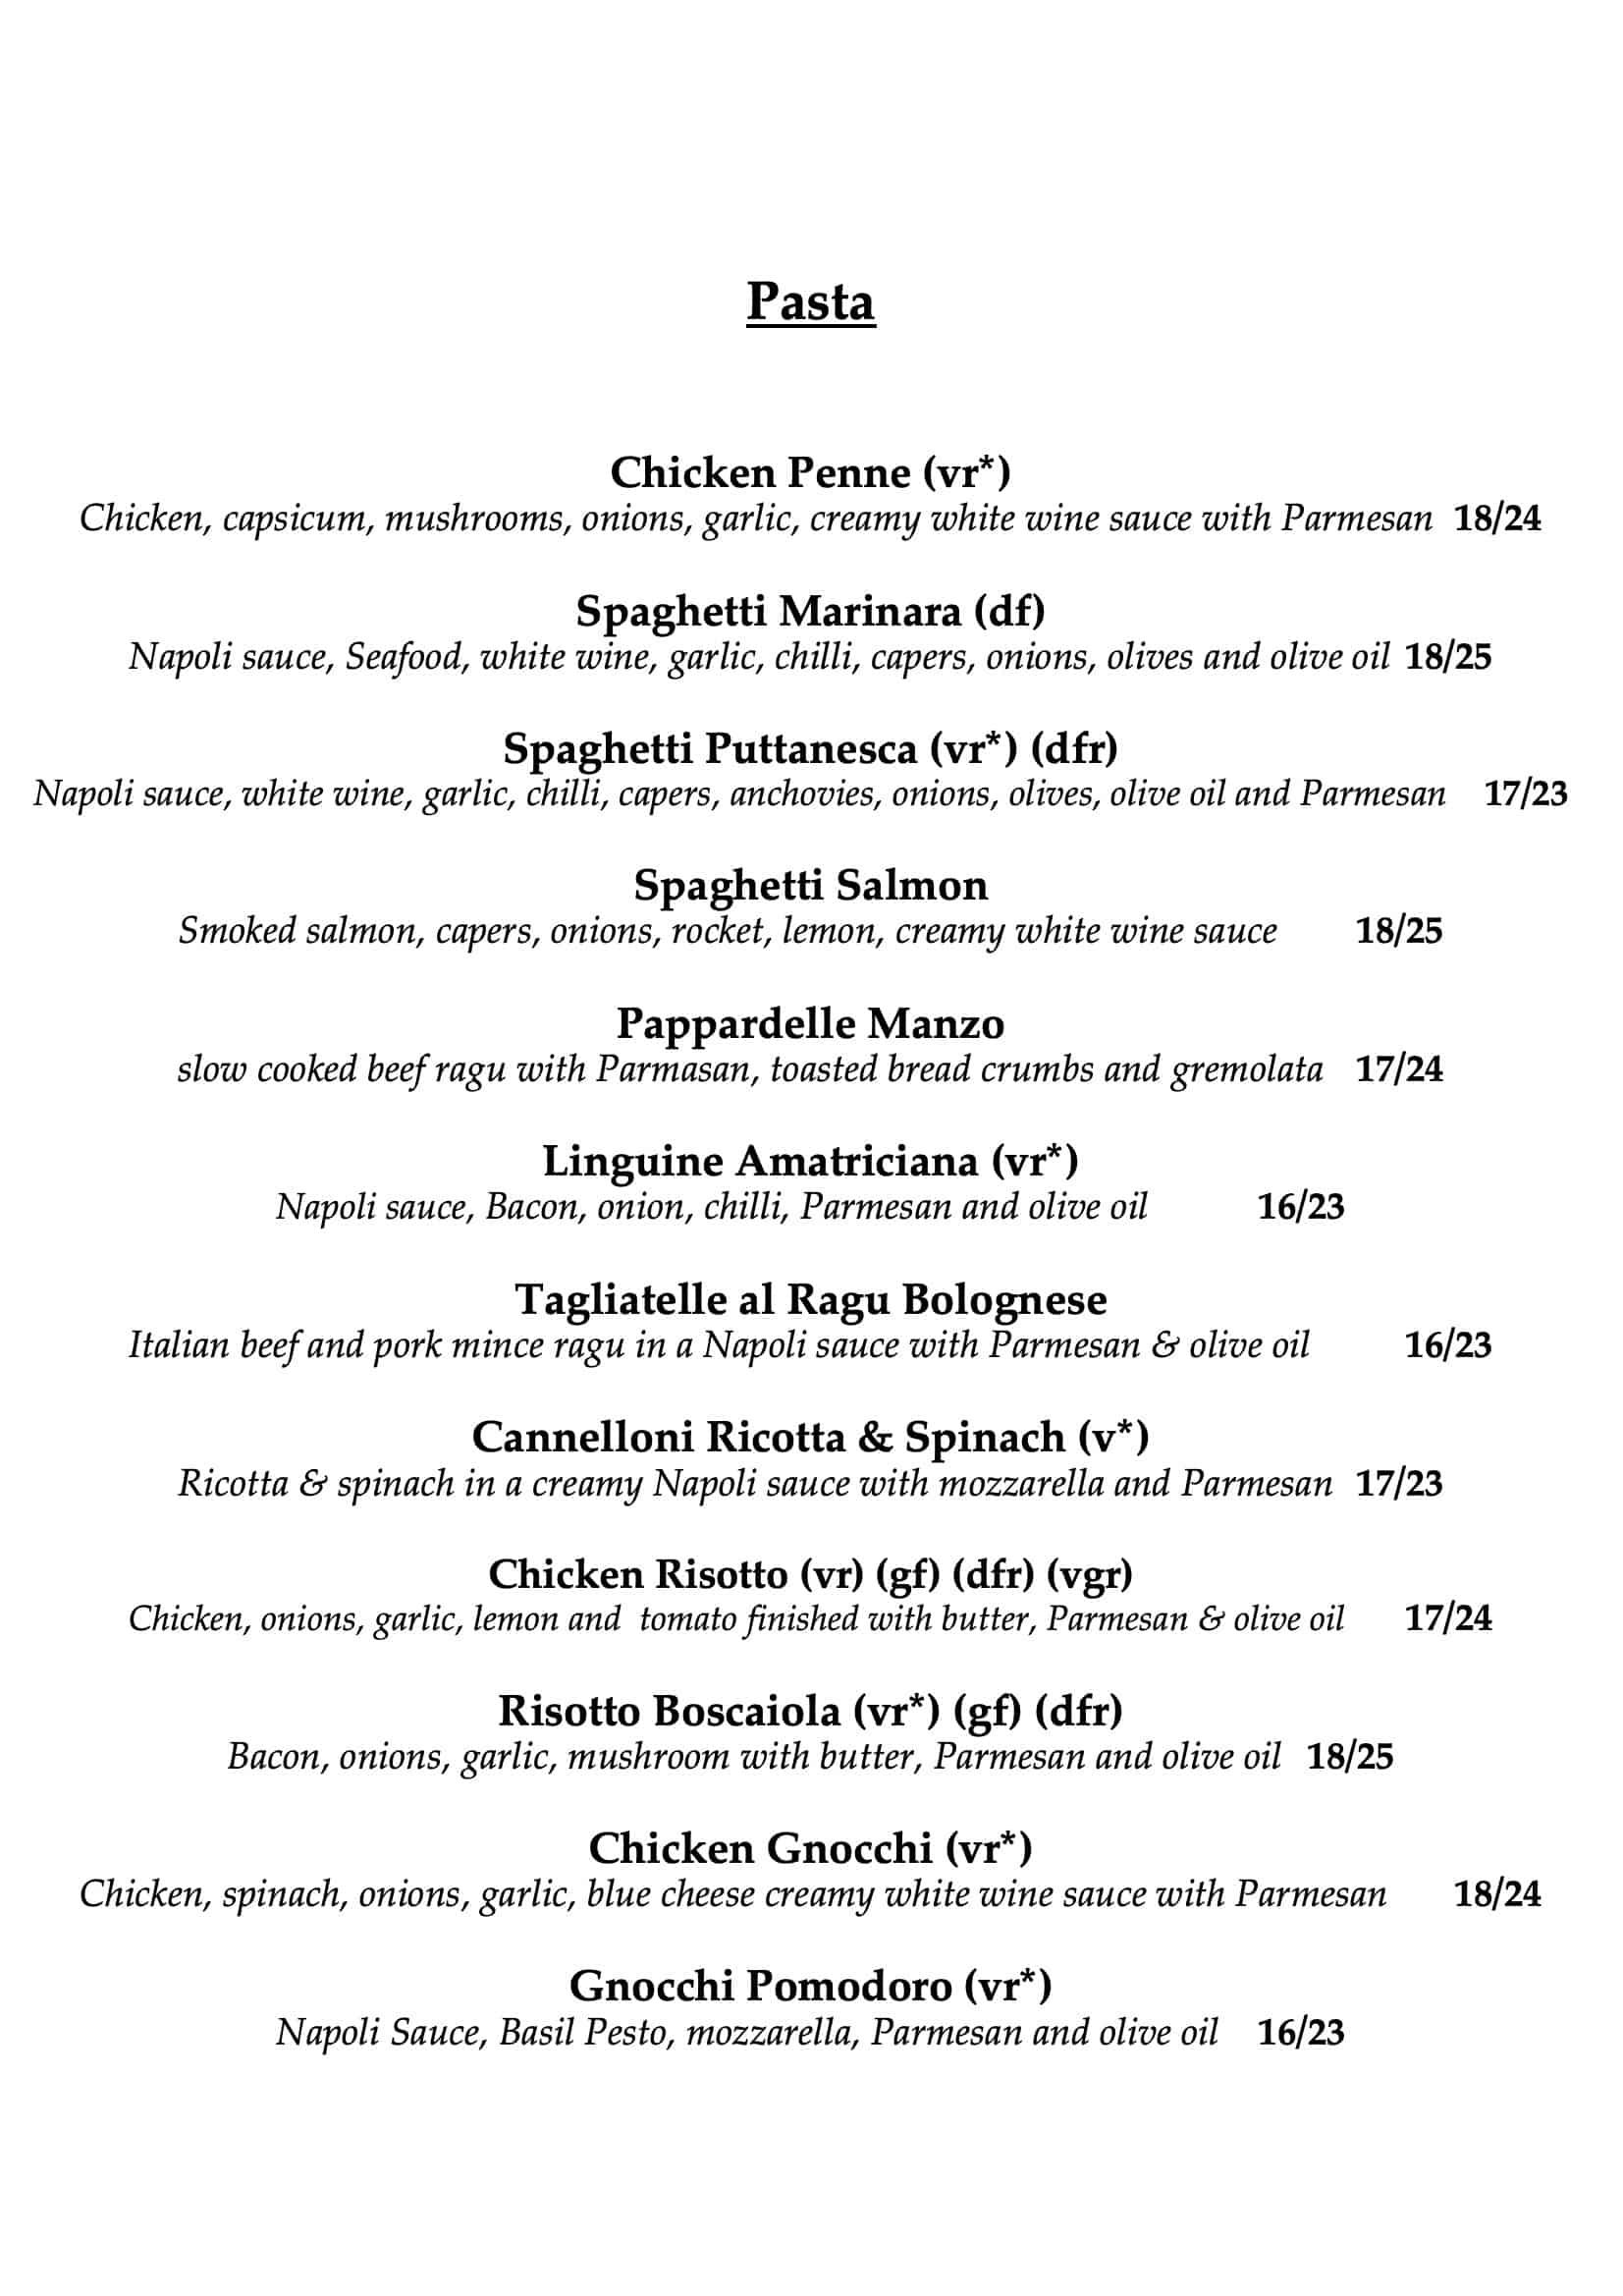 Microsoft Word - 2020 Soprano petone menu .docx 2